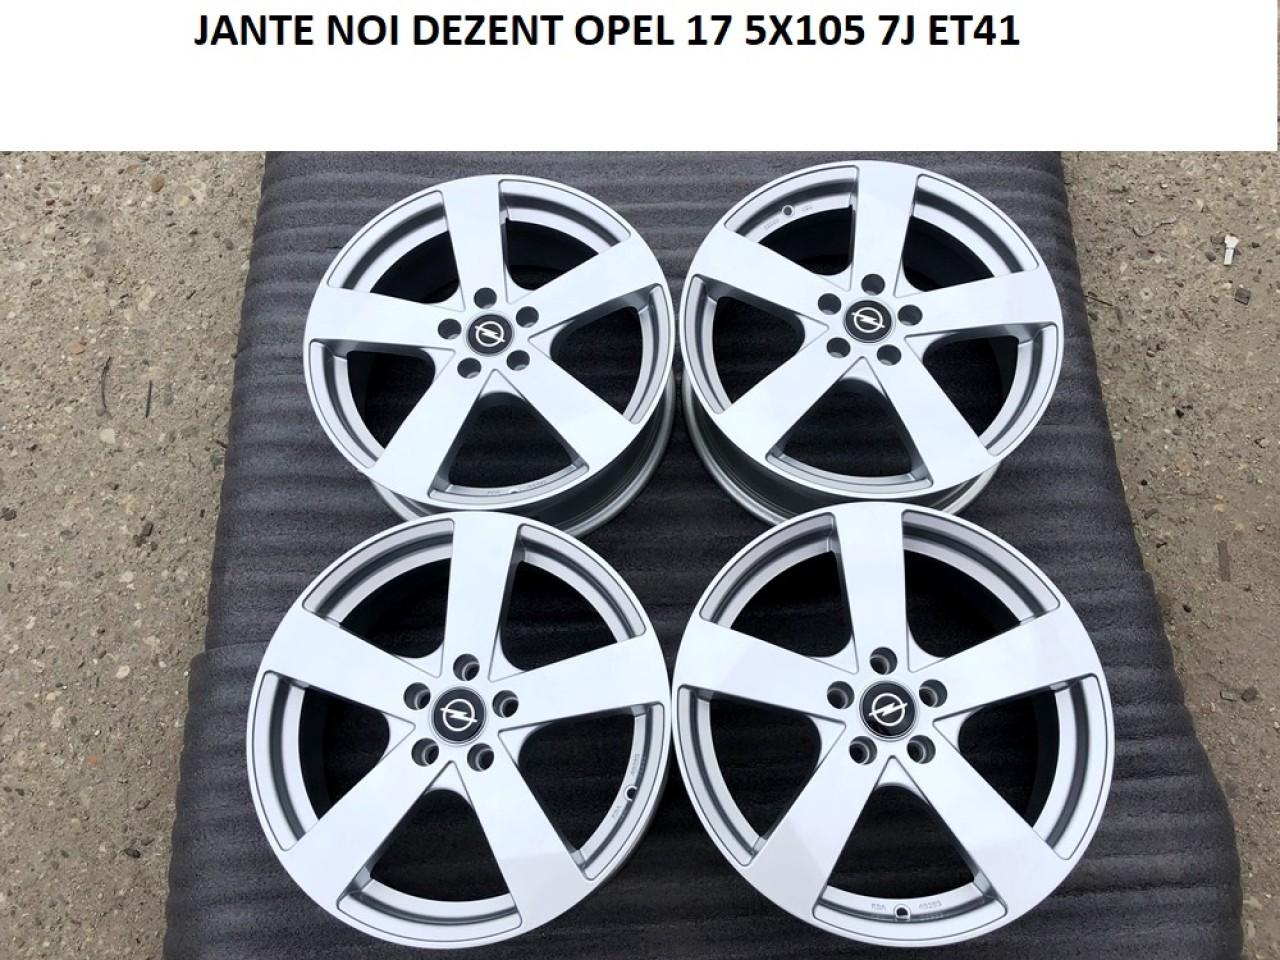 JANTE NOI DEZENT 17 5X105 ASTRA J OPEL